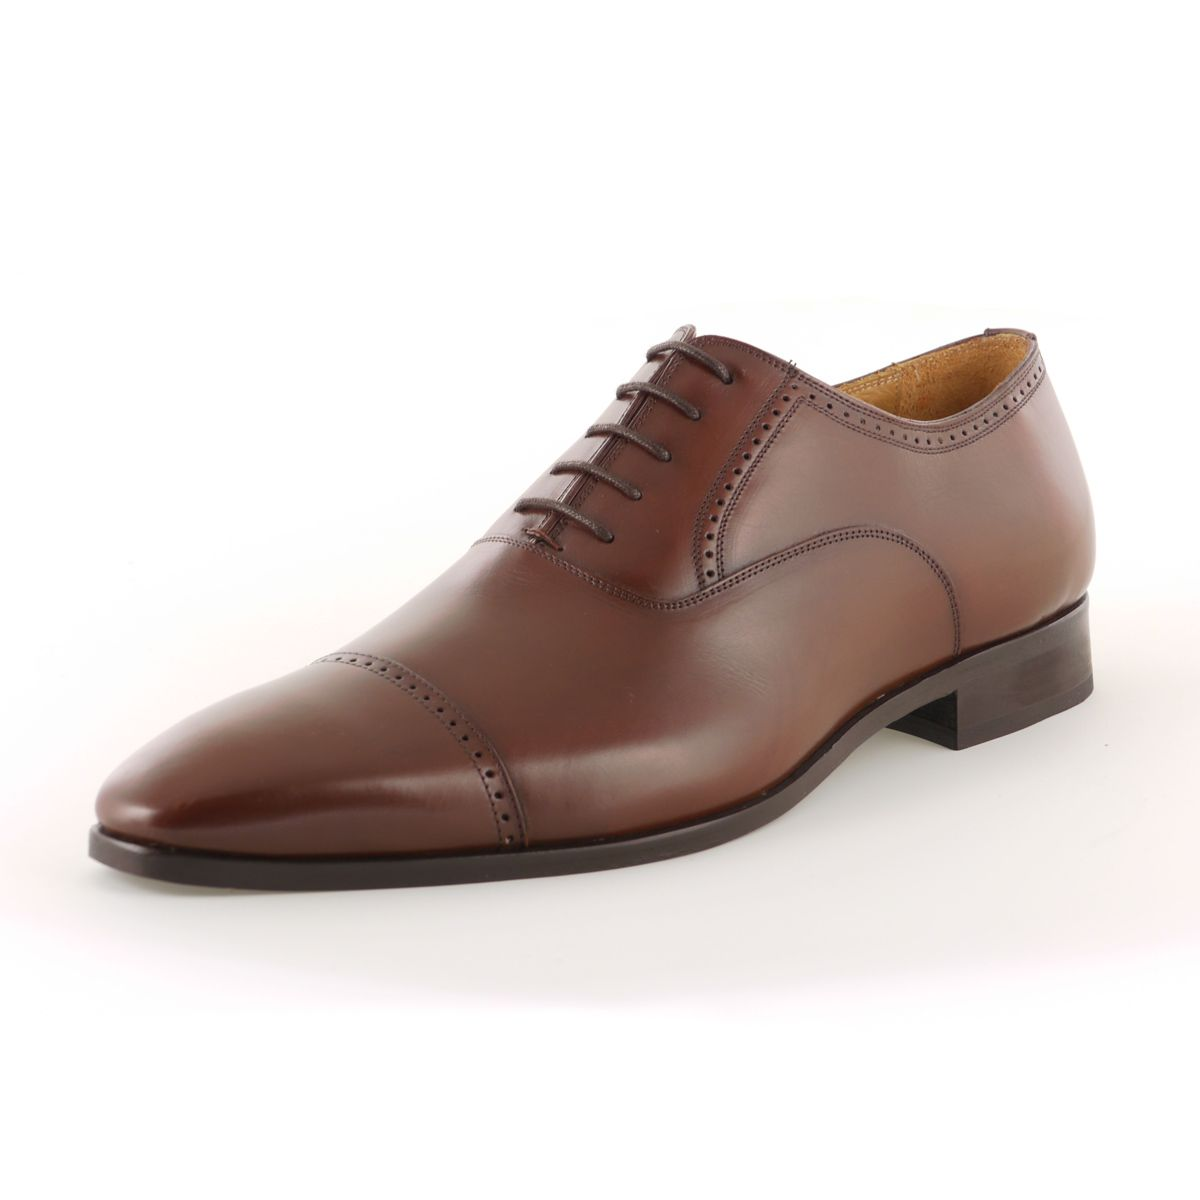 chaussures alain marron en cuir grande taille du 46 au. Black Bedroom Furniture Sets. Home Design Ideas